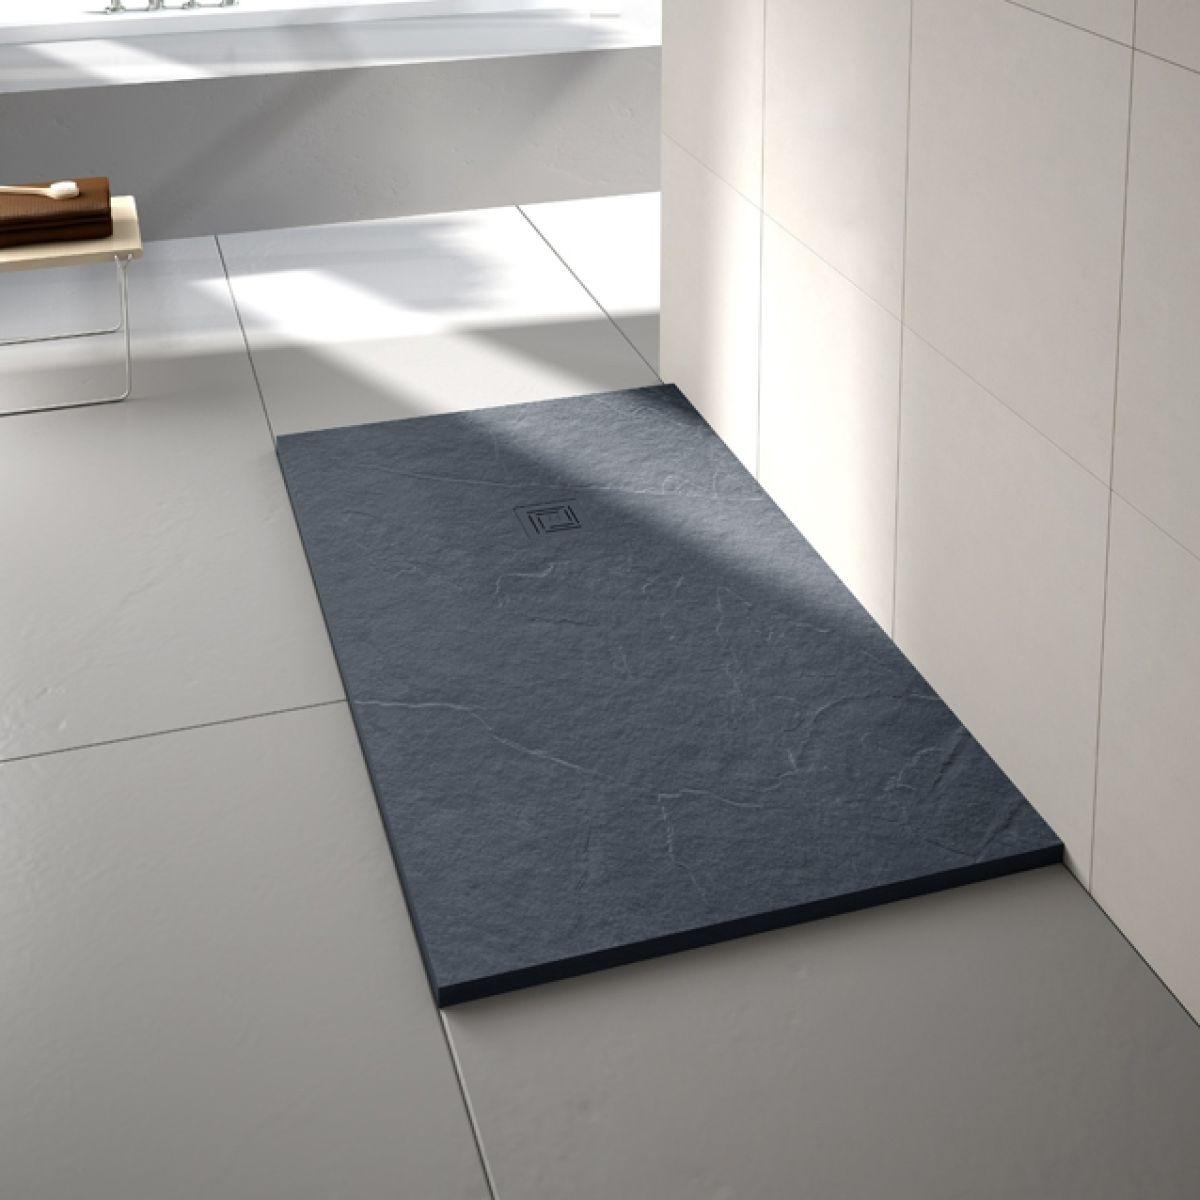 Merlyn Truestone Slate Black Rectangular Shower Tray 1700 x 800mm